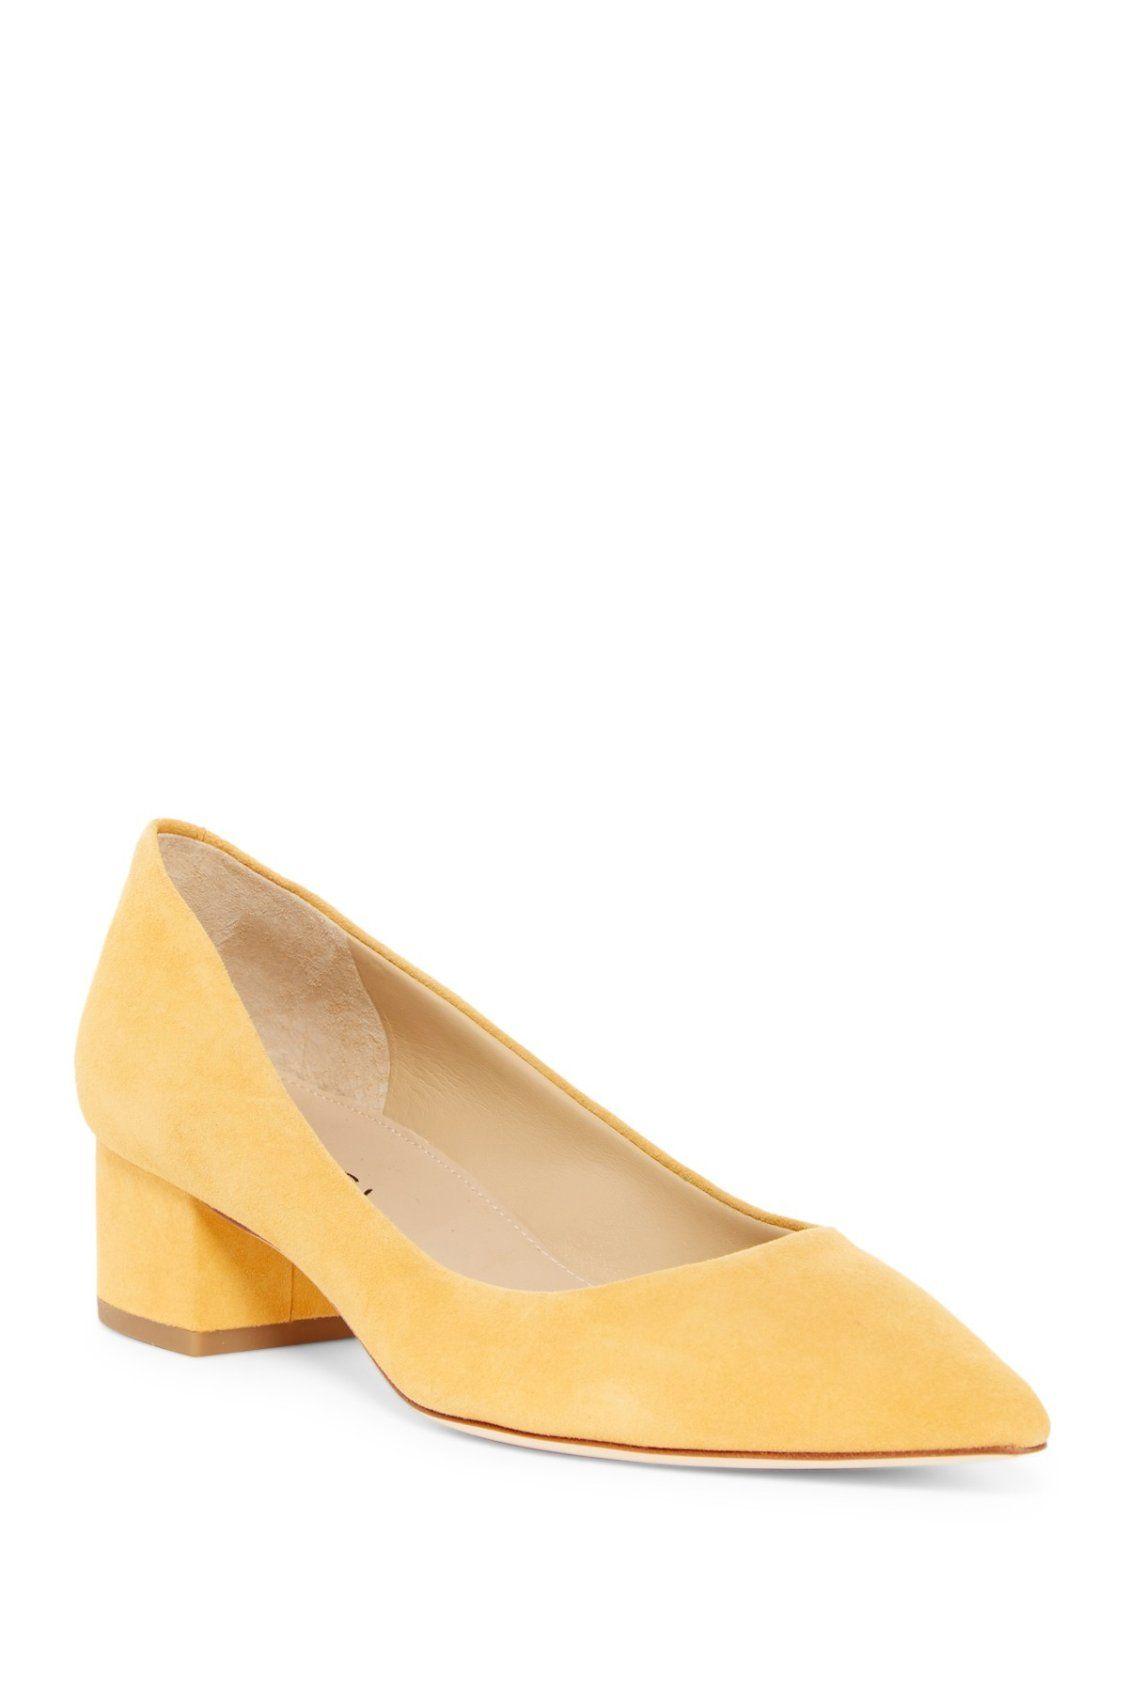 6393b128eb4 Mellow yellow. Via Spiga Guervie Suede Pumps